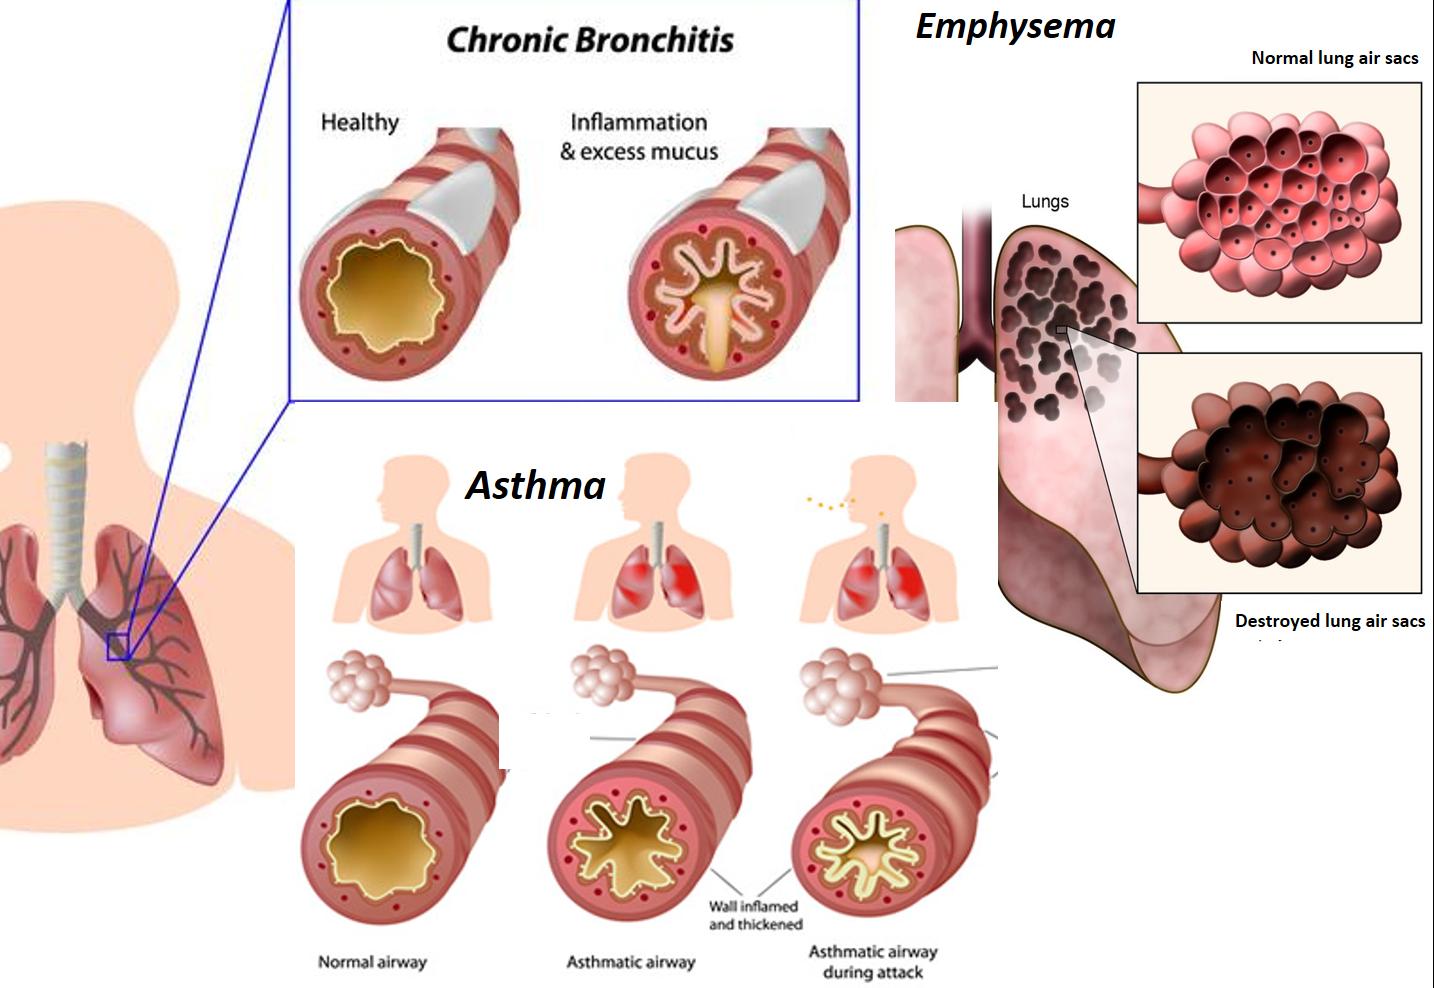 Asthma and Bronchitis pathology